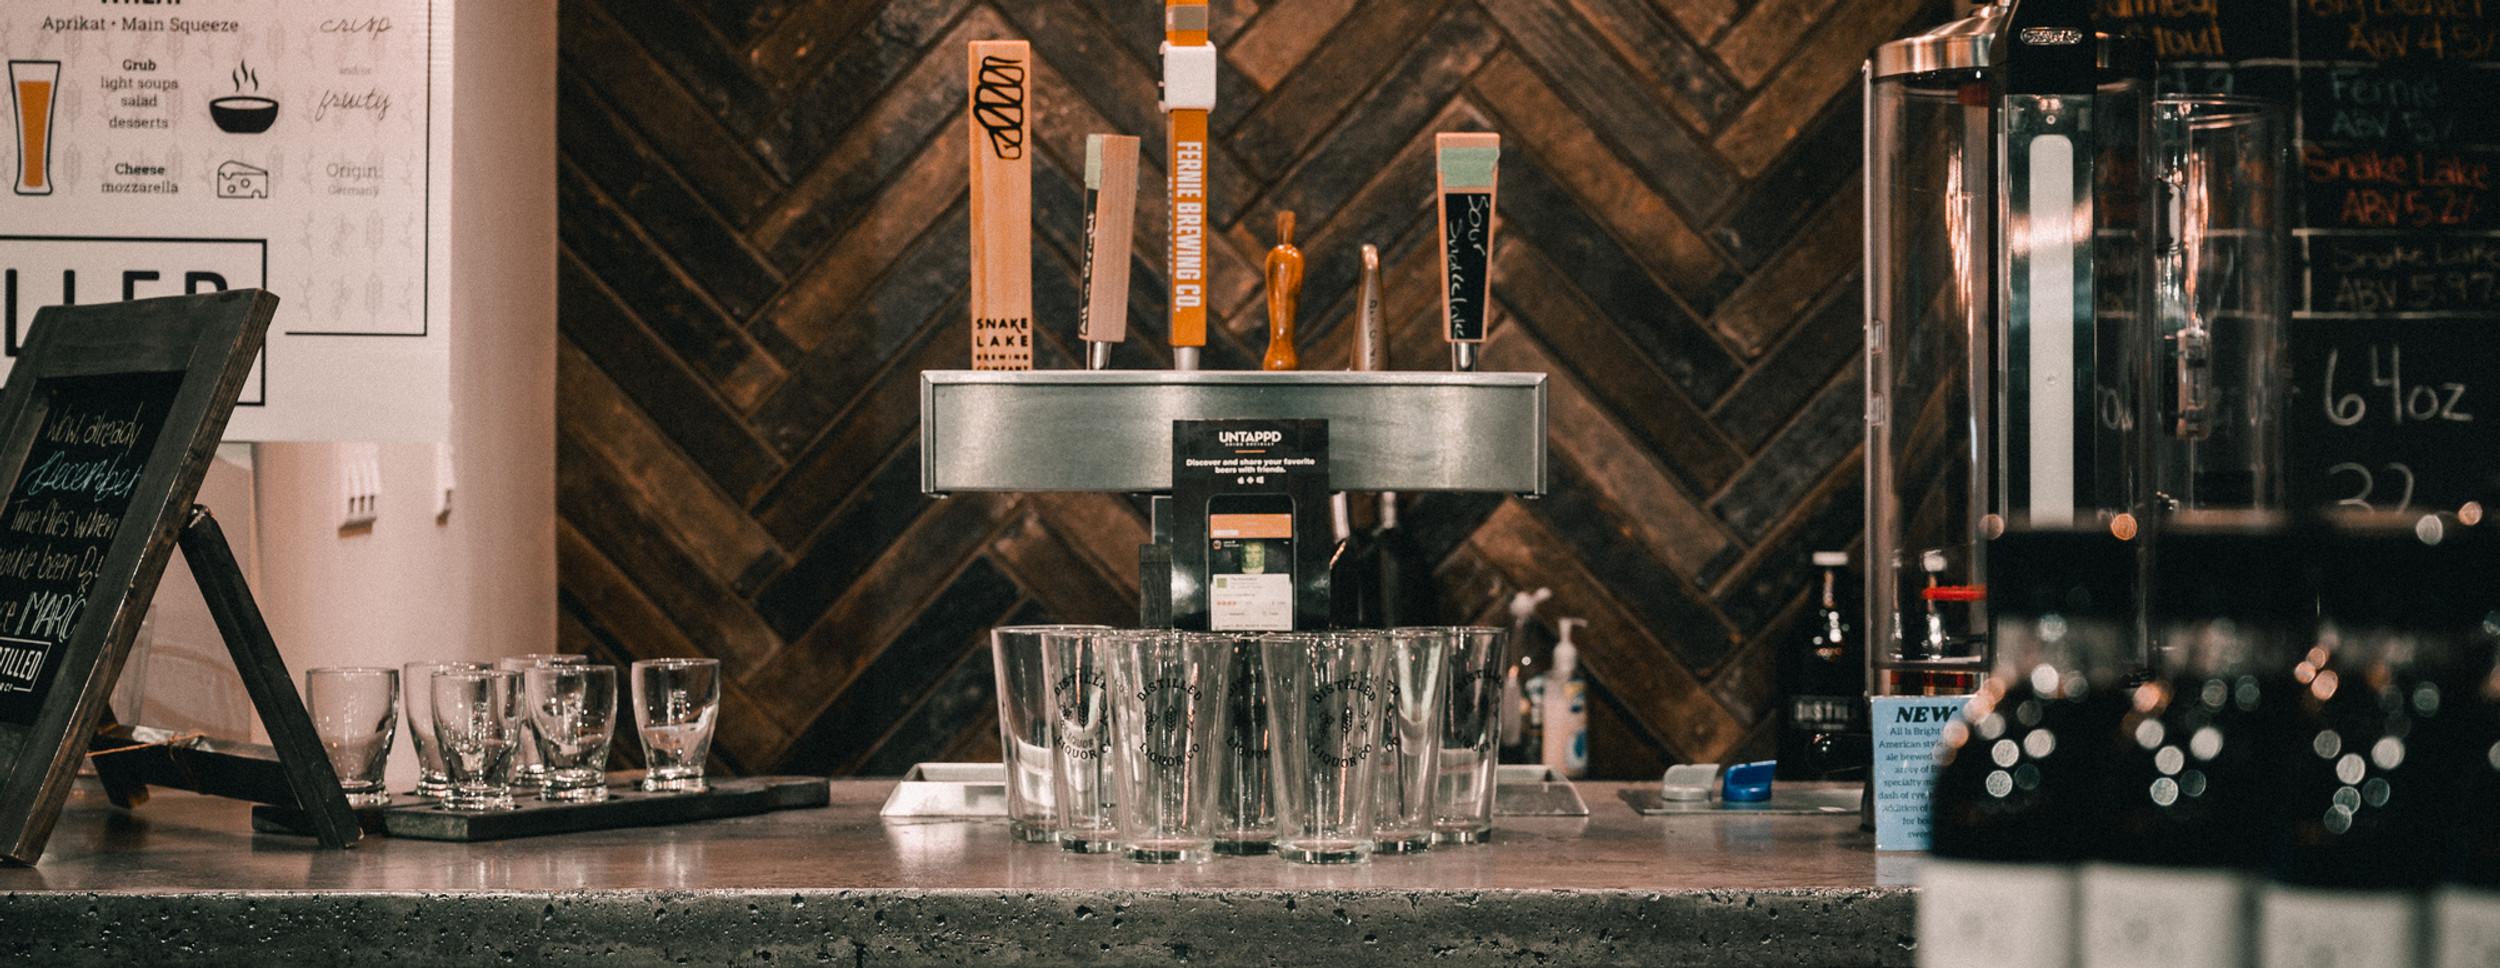 distilledliquor_websitephoto (9 of 27).j